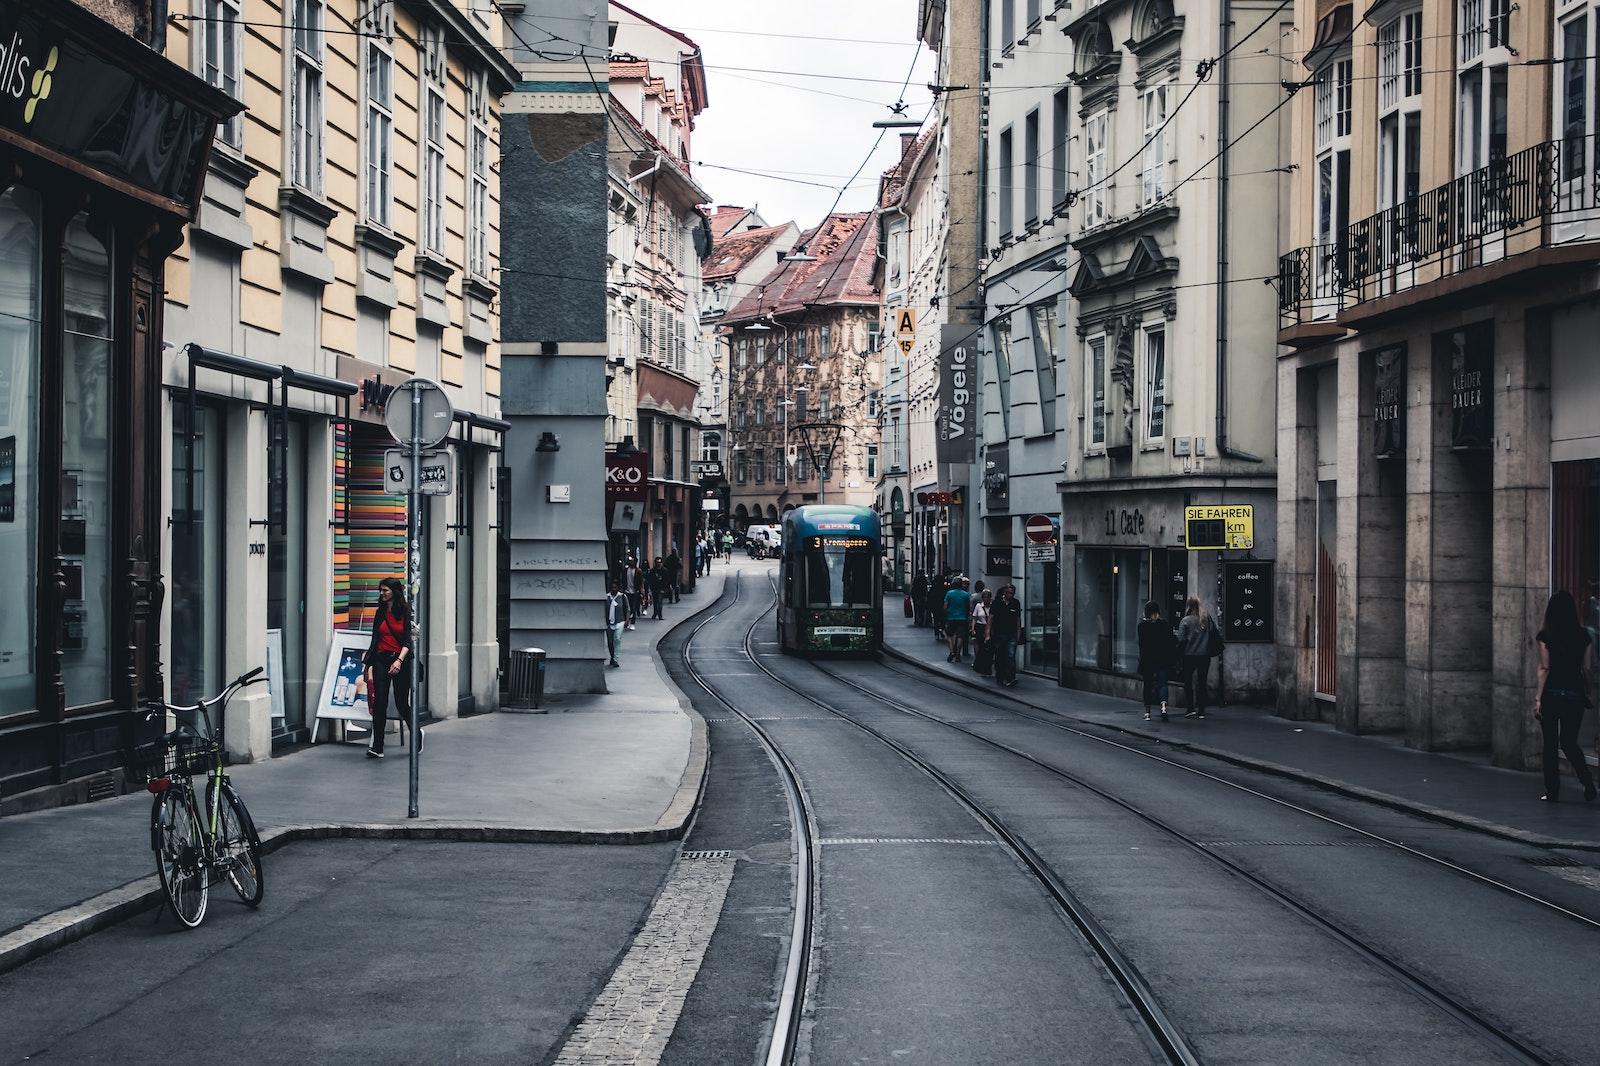 Steiermark – OIB-Richtlinien 2019 ab 1. September 2020 in Kraft